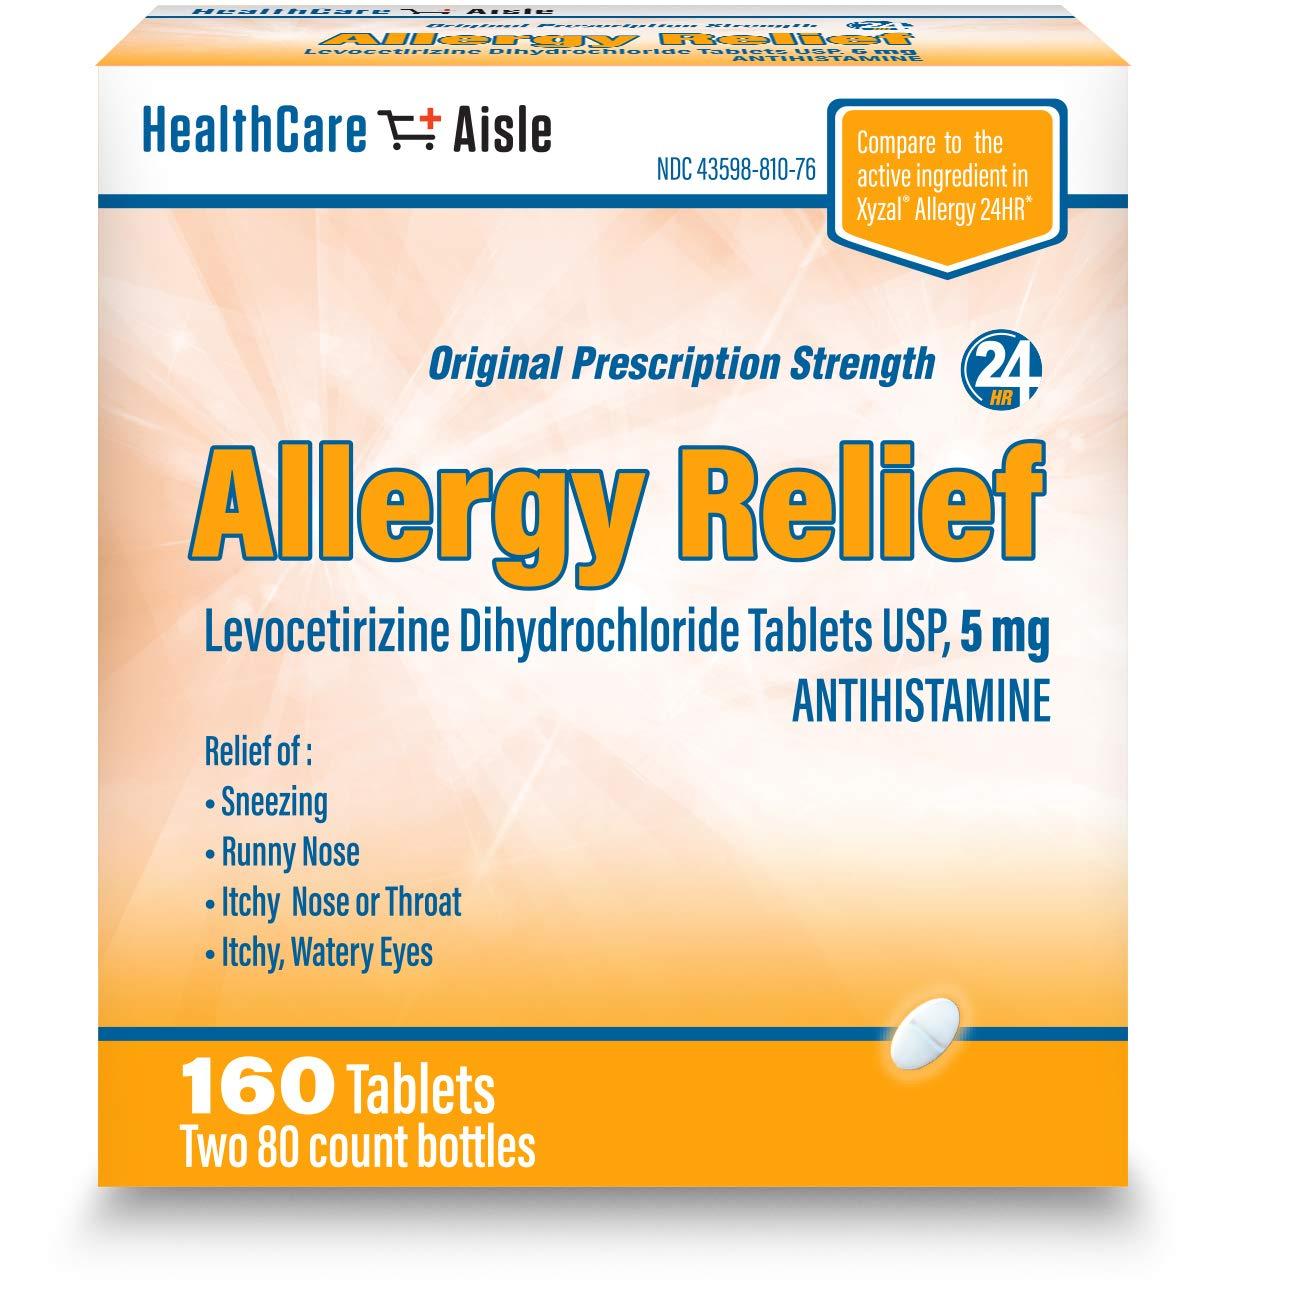 HealthCareAisle Allergy Relief Levocetirizine Dihydrochloride Tablets, USP | 24 Hour Allergy Relief | 5 mg | 160 Count by HealthCareAisle